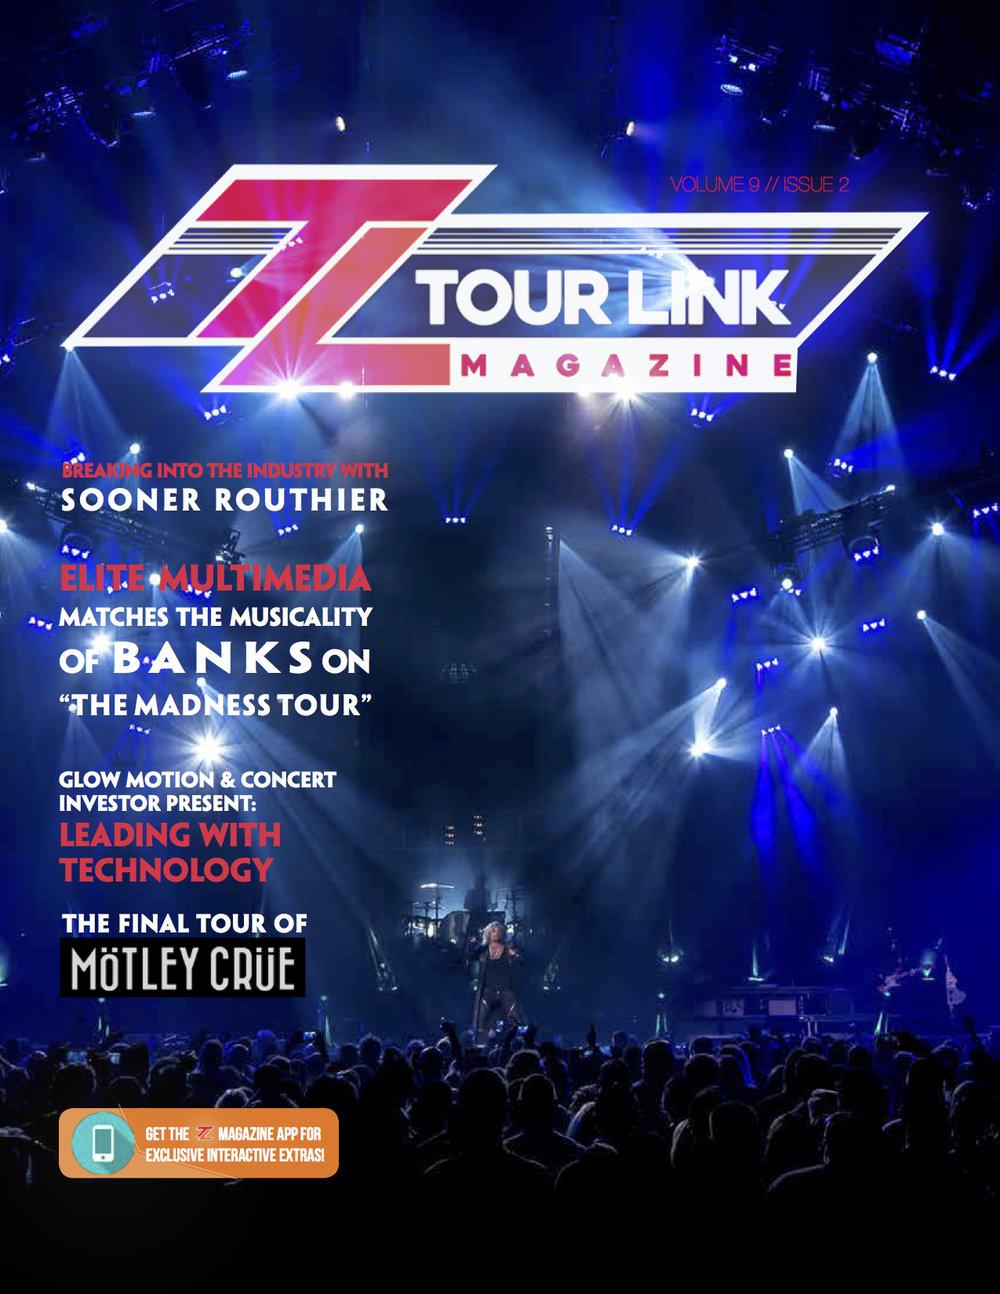 Tour Link Magazine, Issue 2